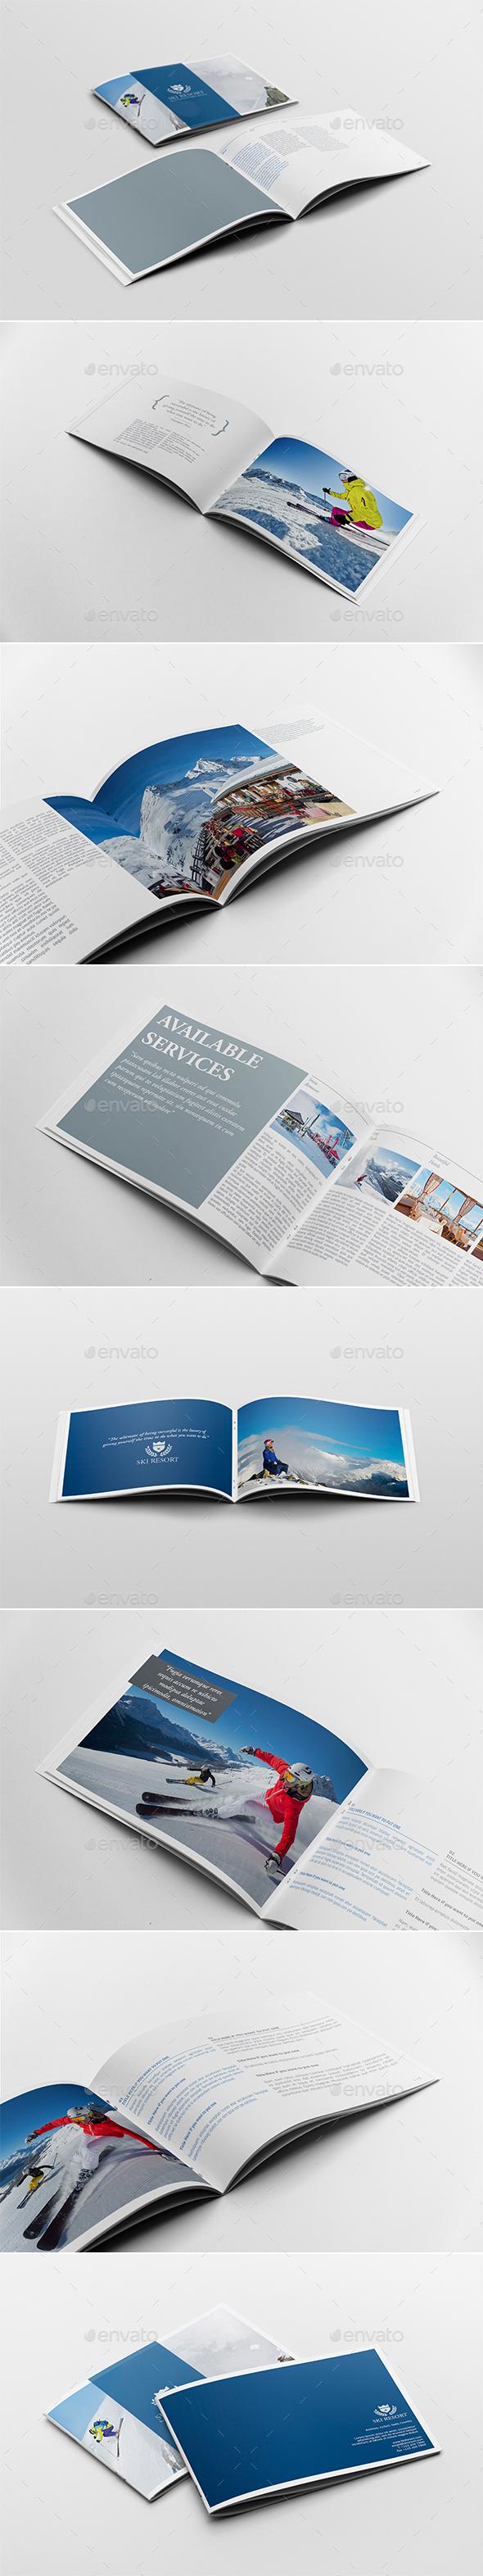 Travel Brochure Template Graphics, Designs & Templates